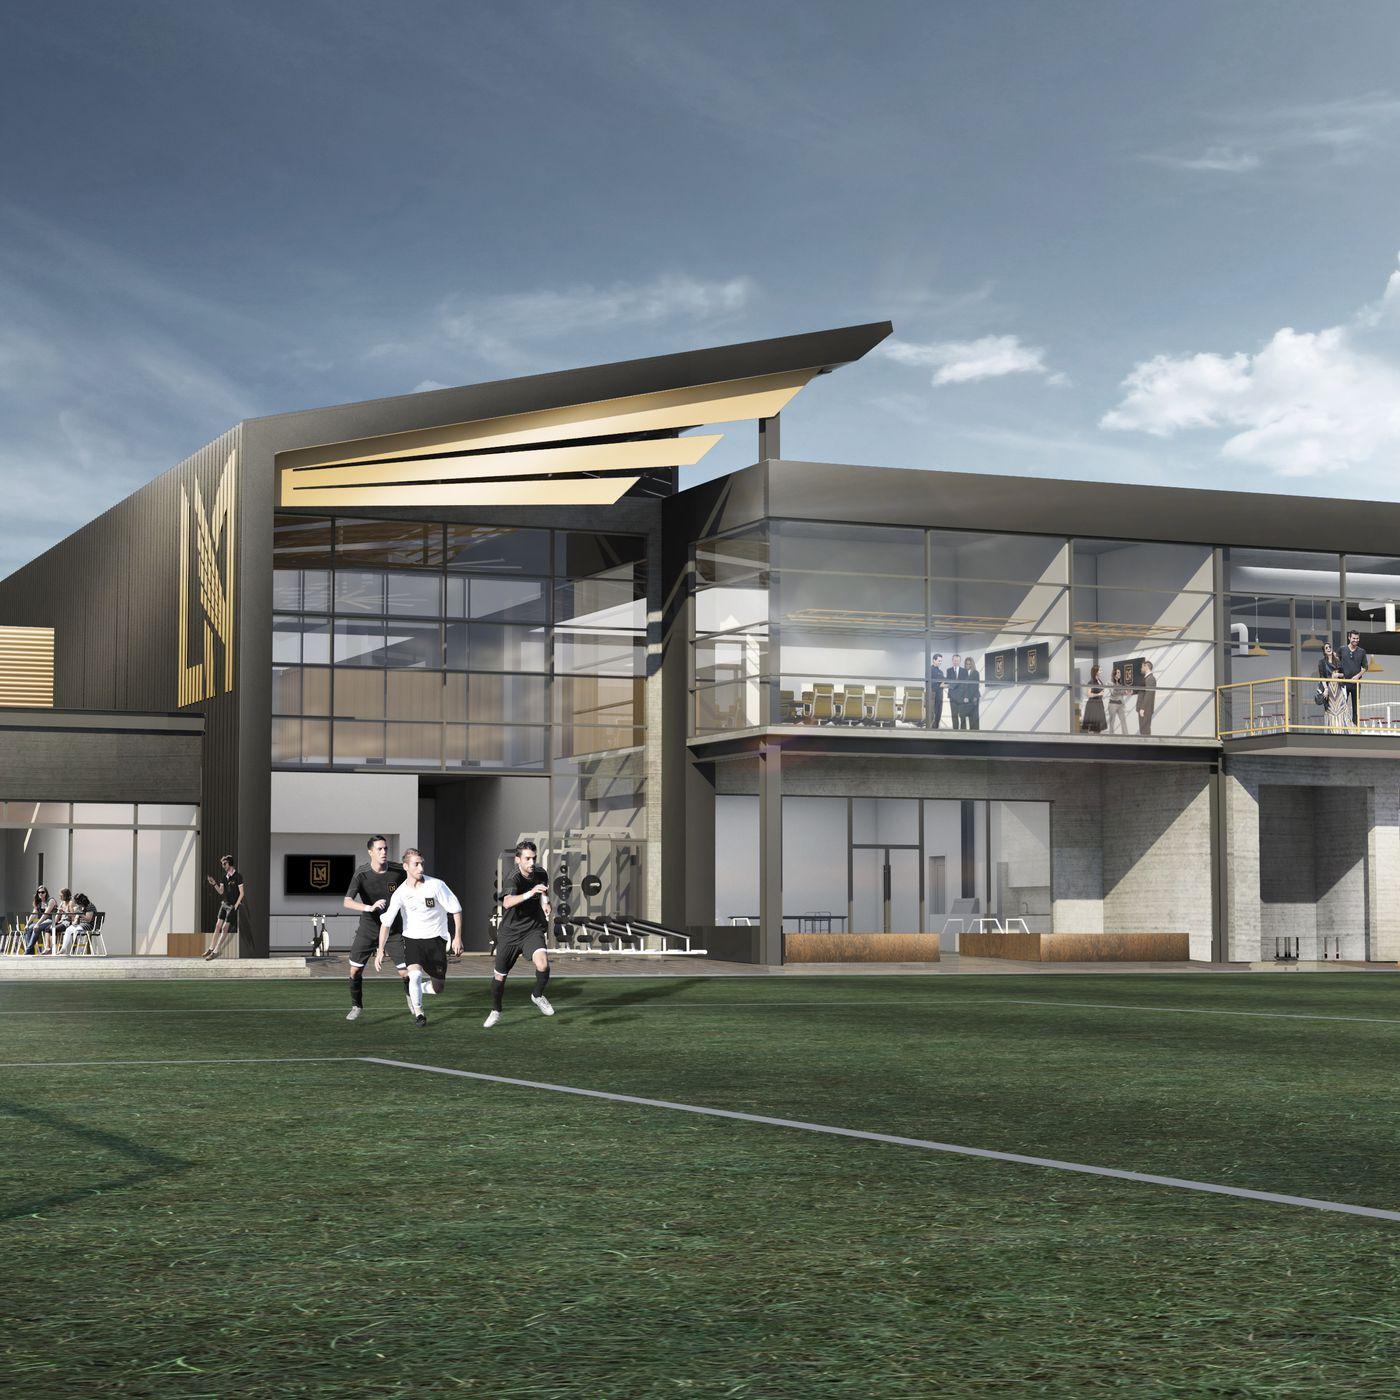 LAFC open permanent training facility at Cal State LA